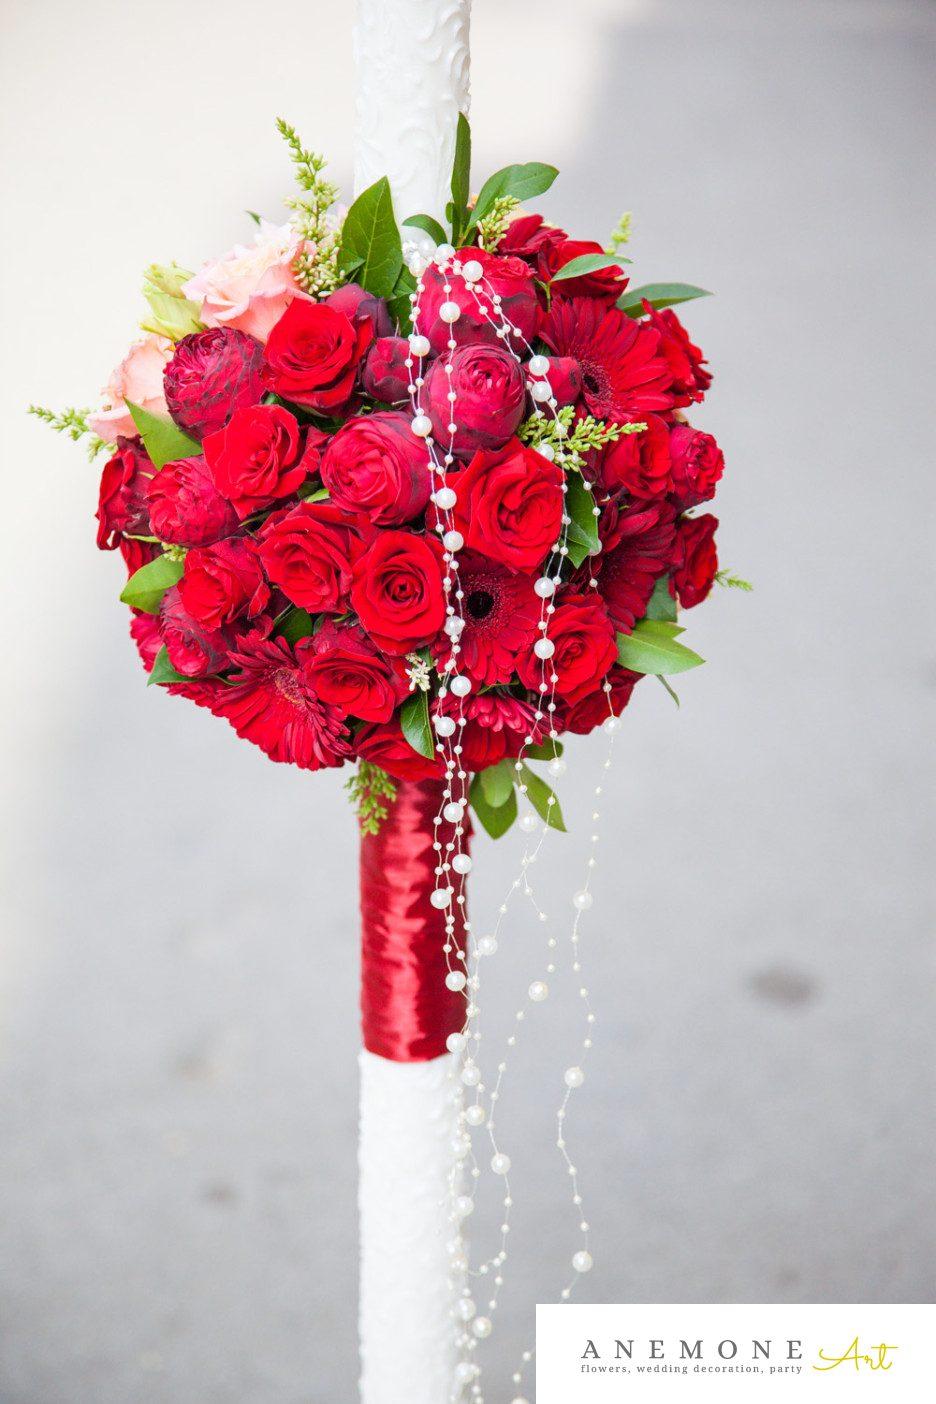 Poza, foto cu Flori de nunta lumanare cununie, rosu, trandafiri, visiniu in Arad, Timisoara, Oradea (wedding flowers, bouquets) nunta Arad, Timisoara, Oradea